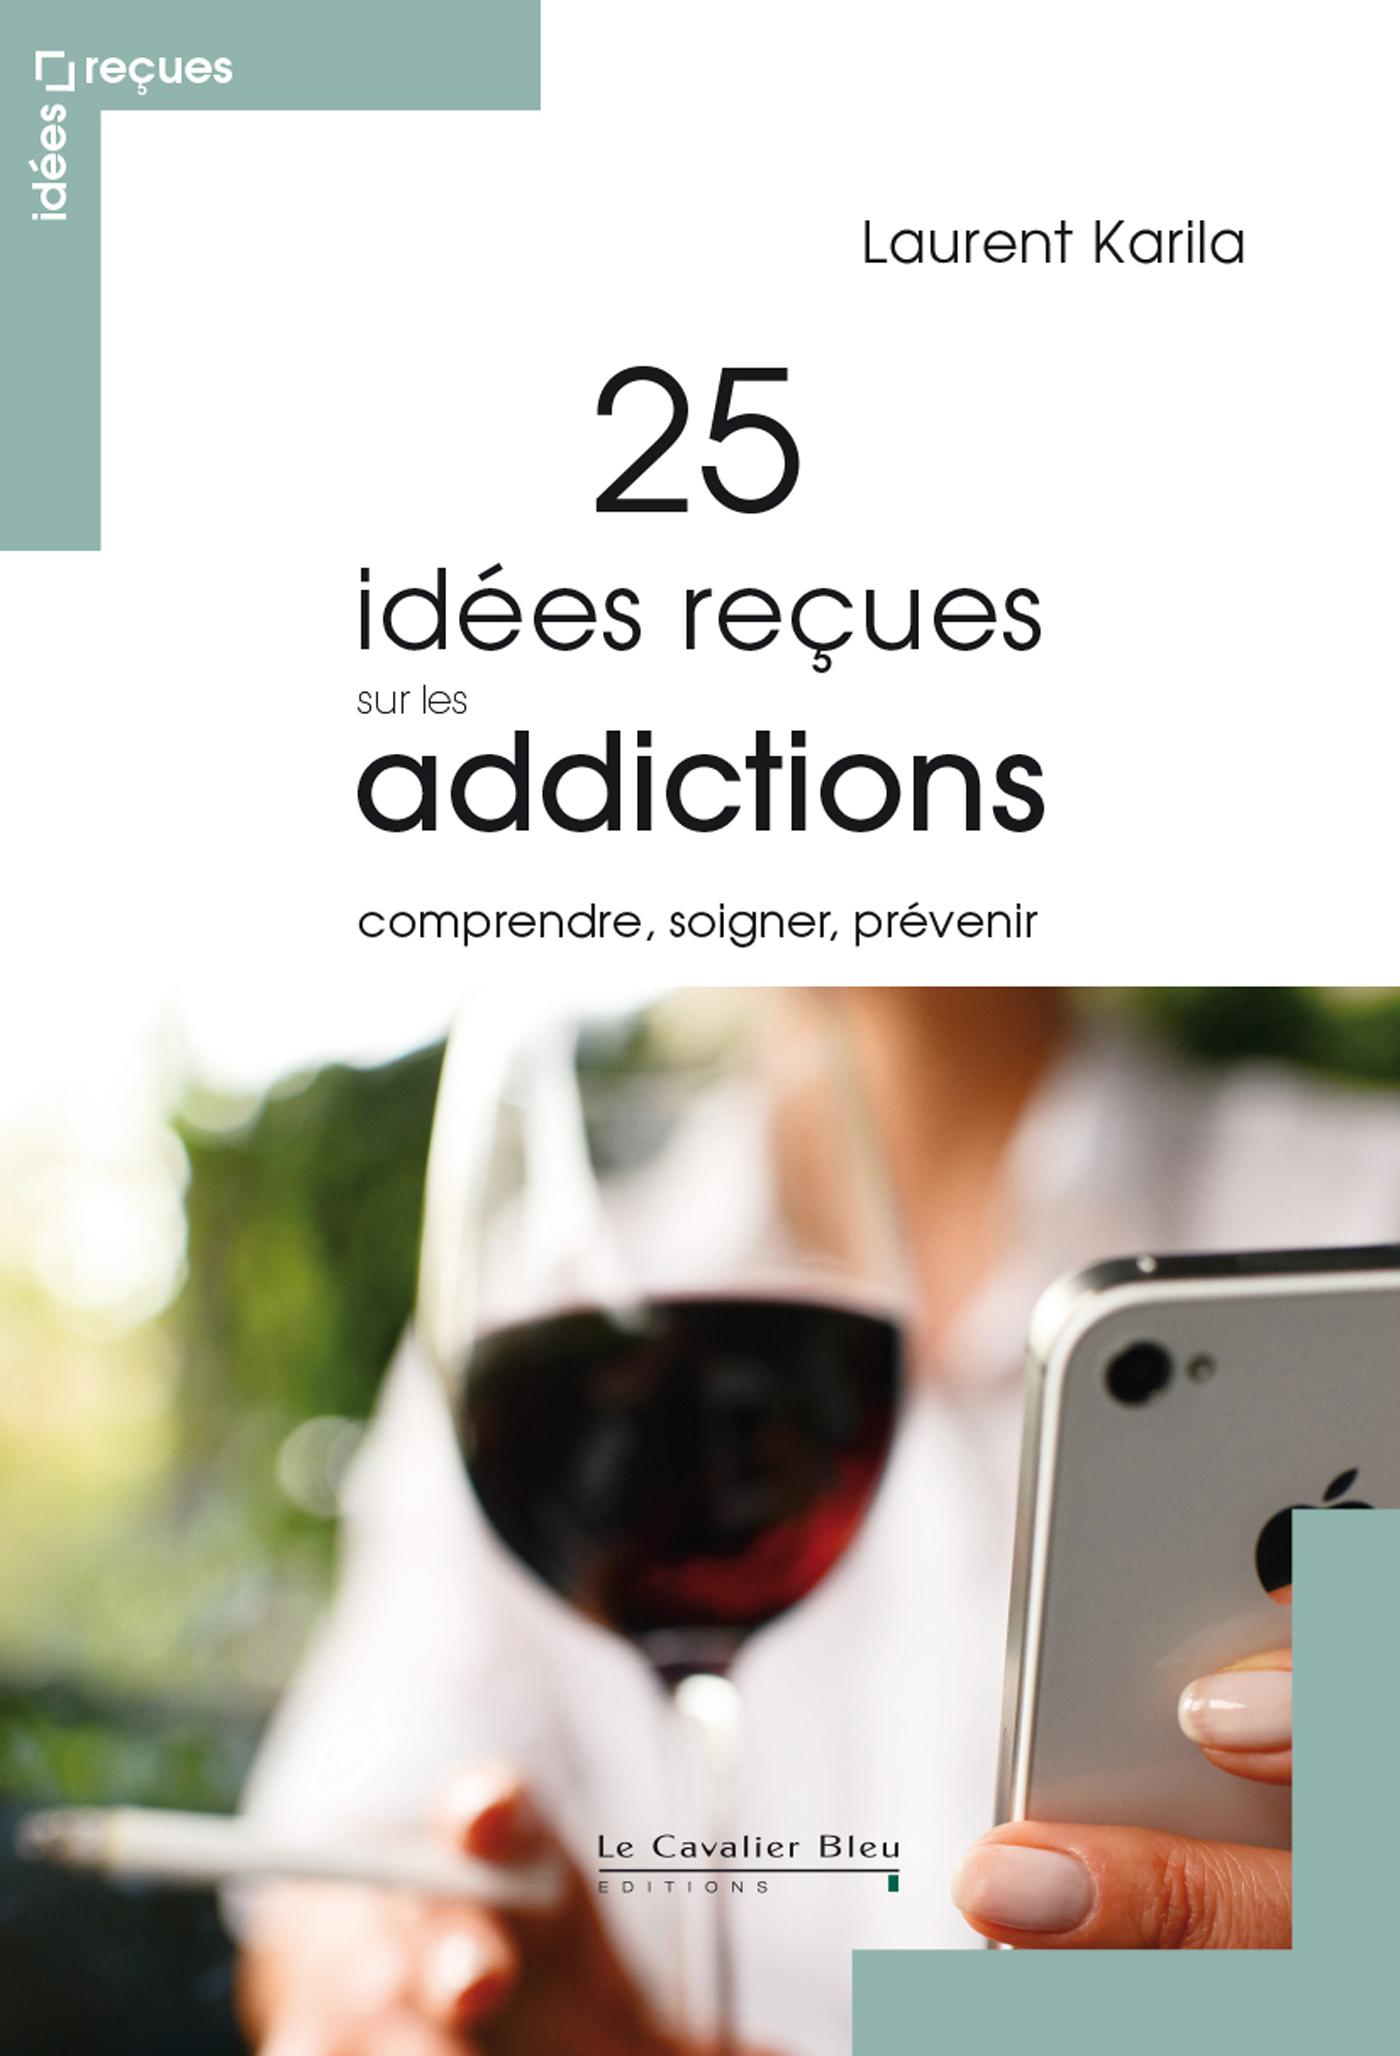 25 IDEES RECUES SUR LES ADDICTIONS